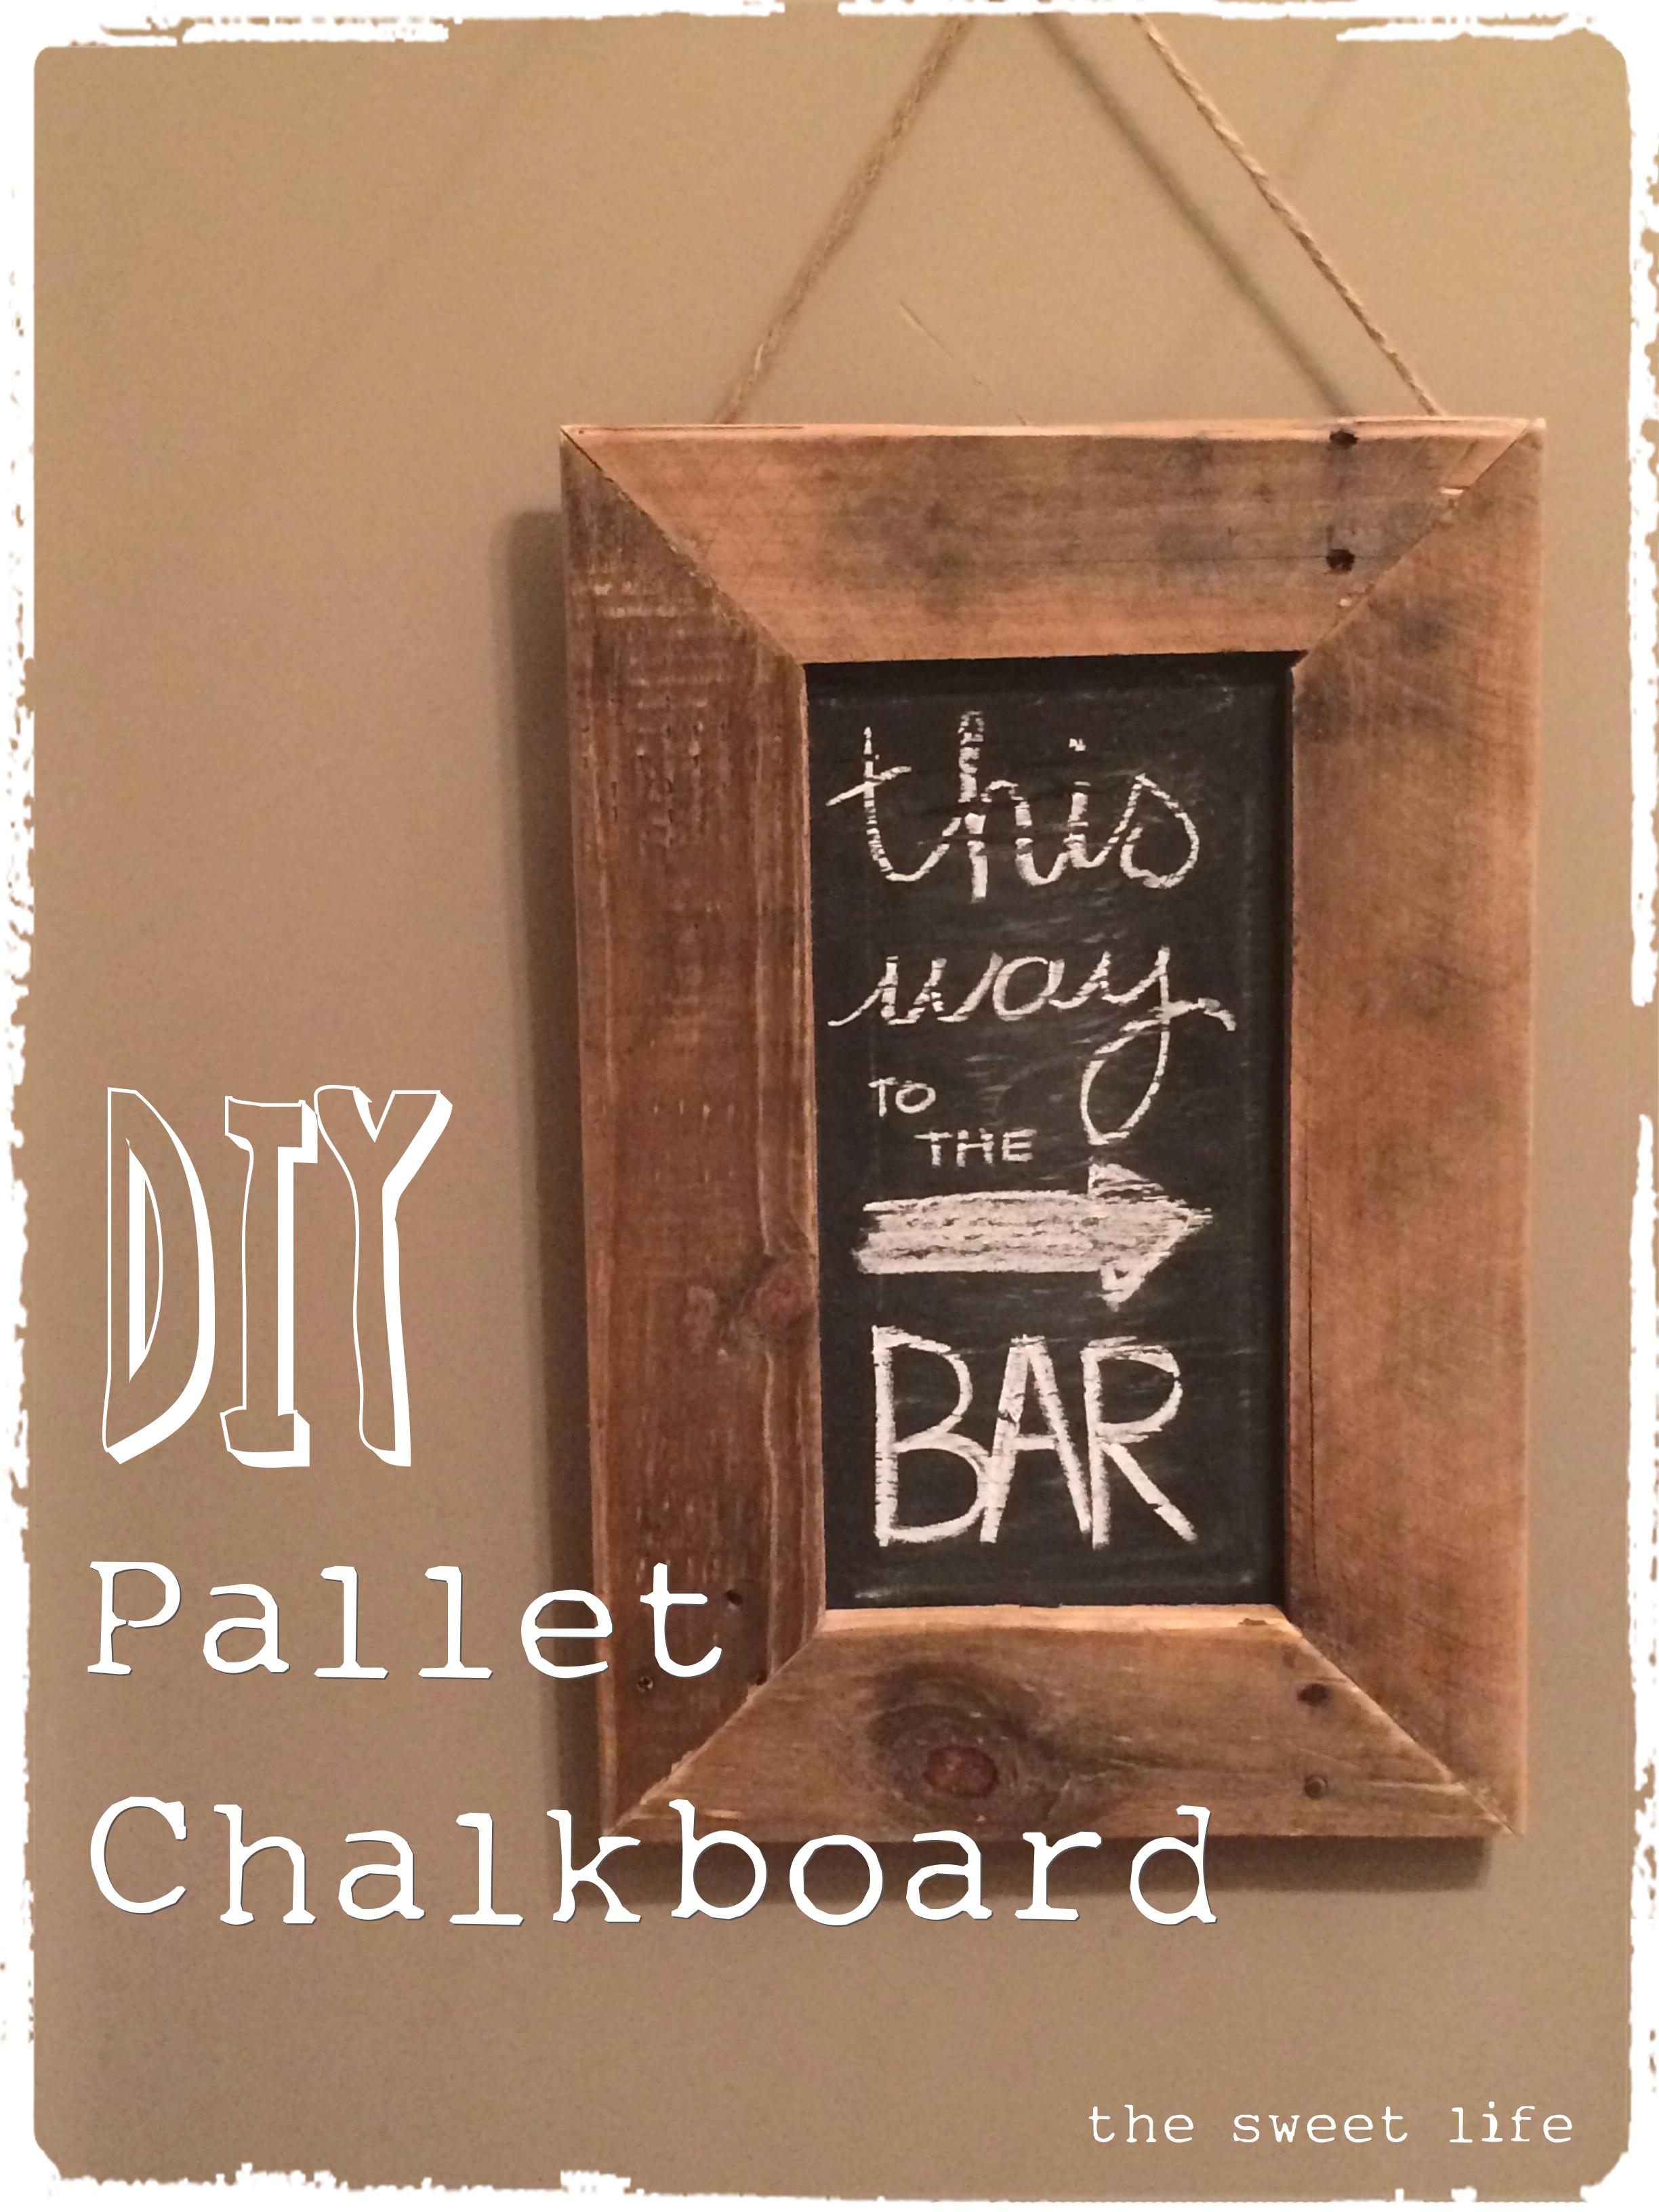 DIY Pallet Chalkboard that hangs 2 ways  The Sweet Life